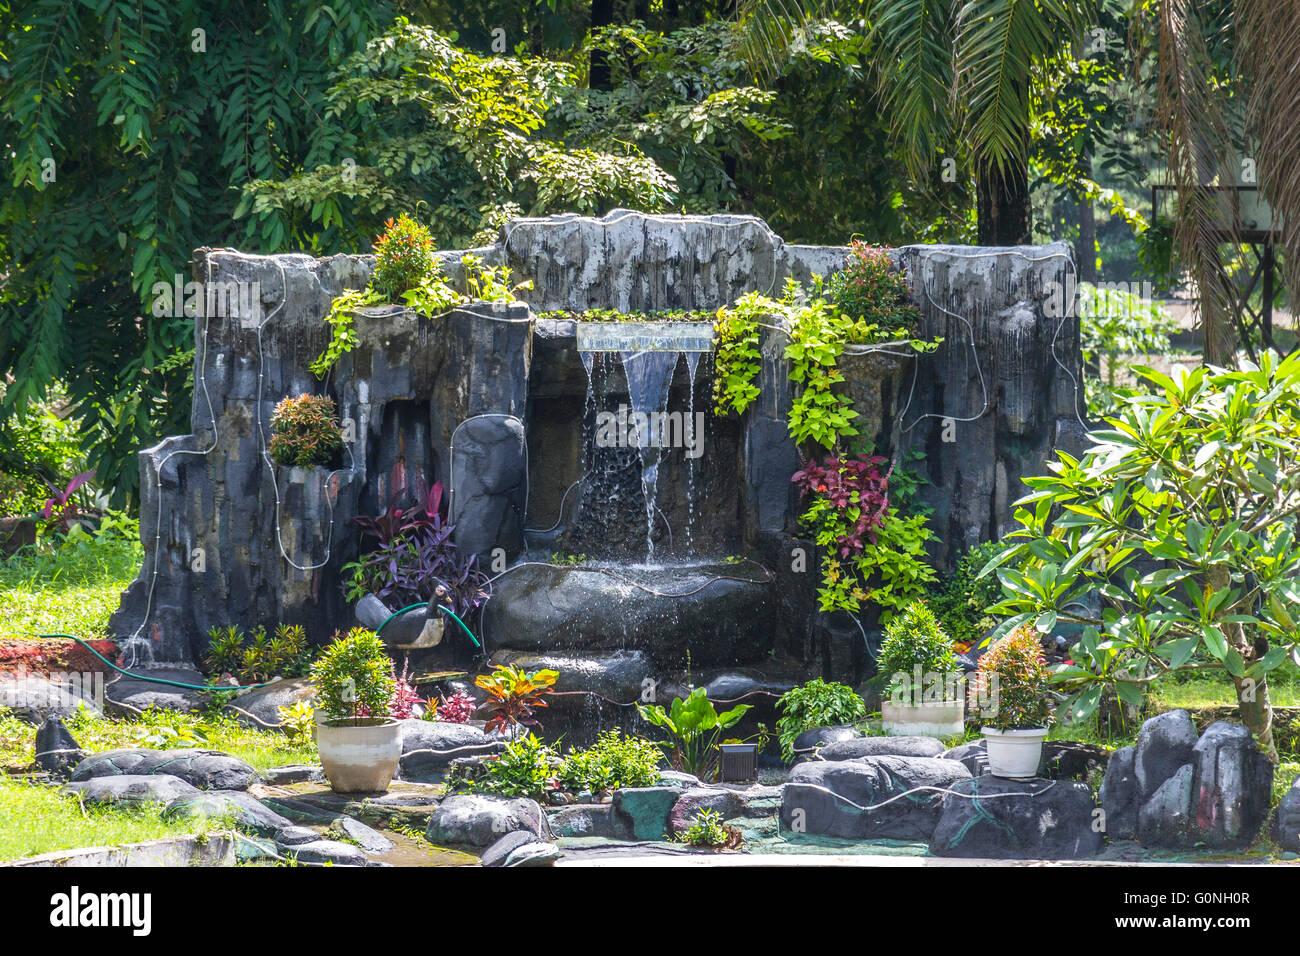 Fountain in taman mini Park - Stock Image